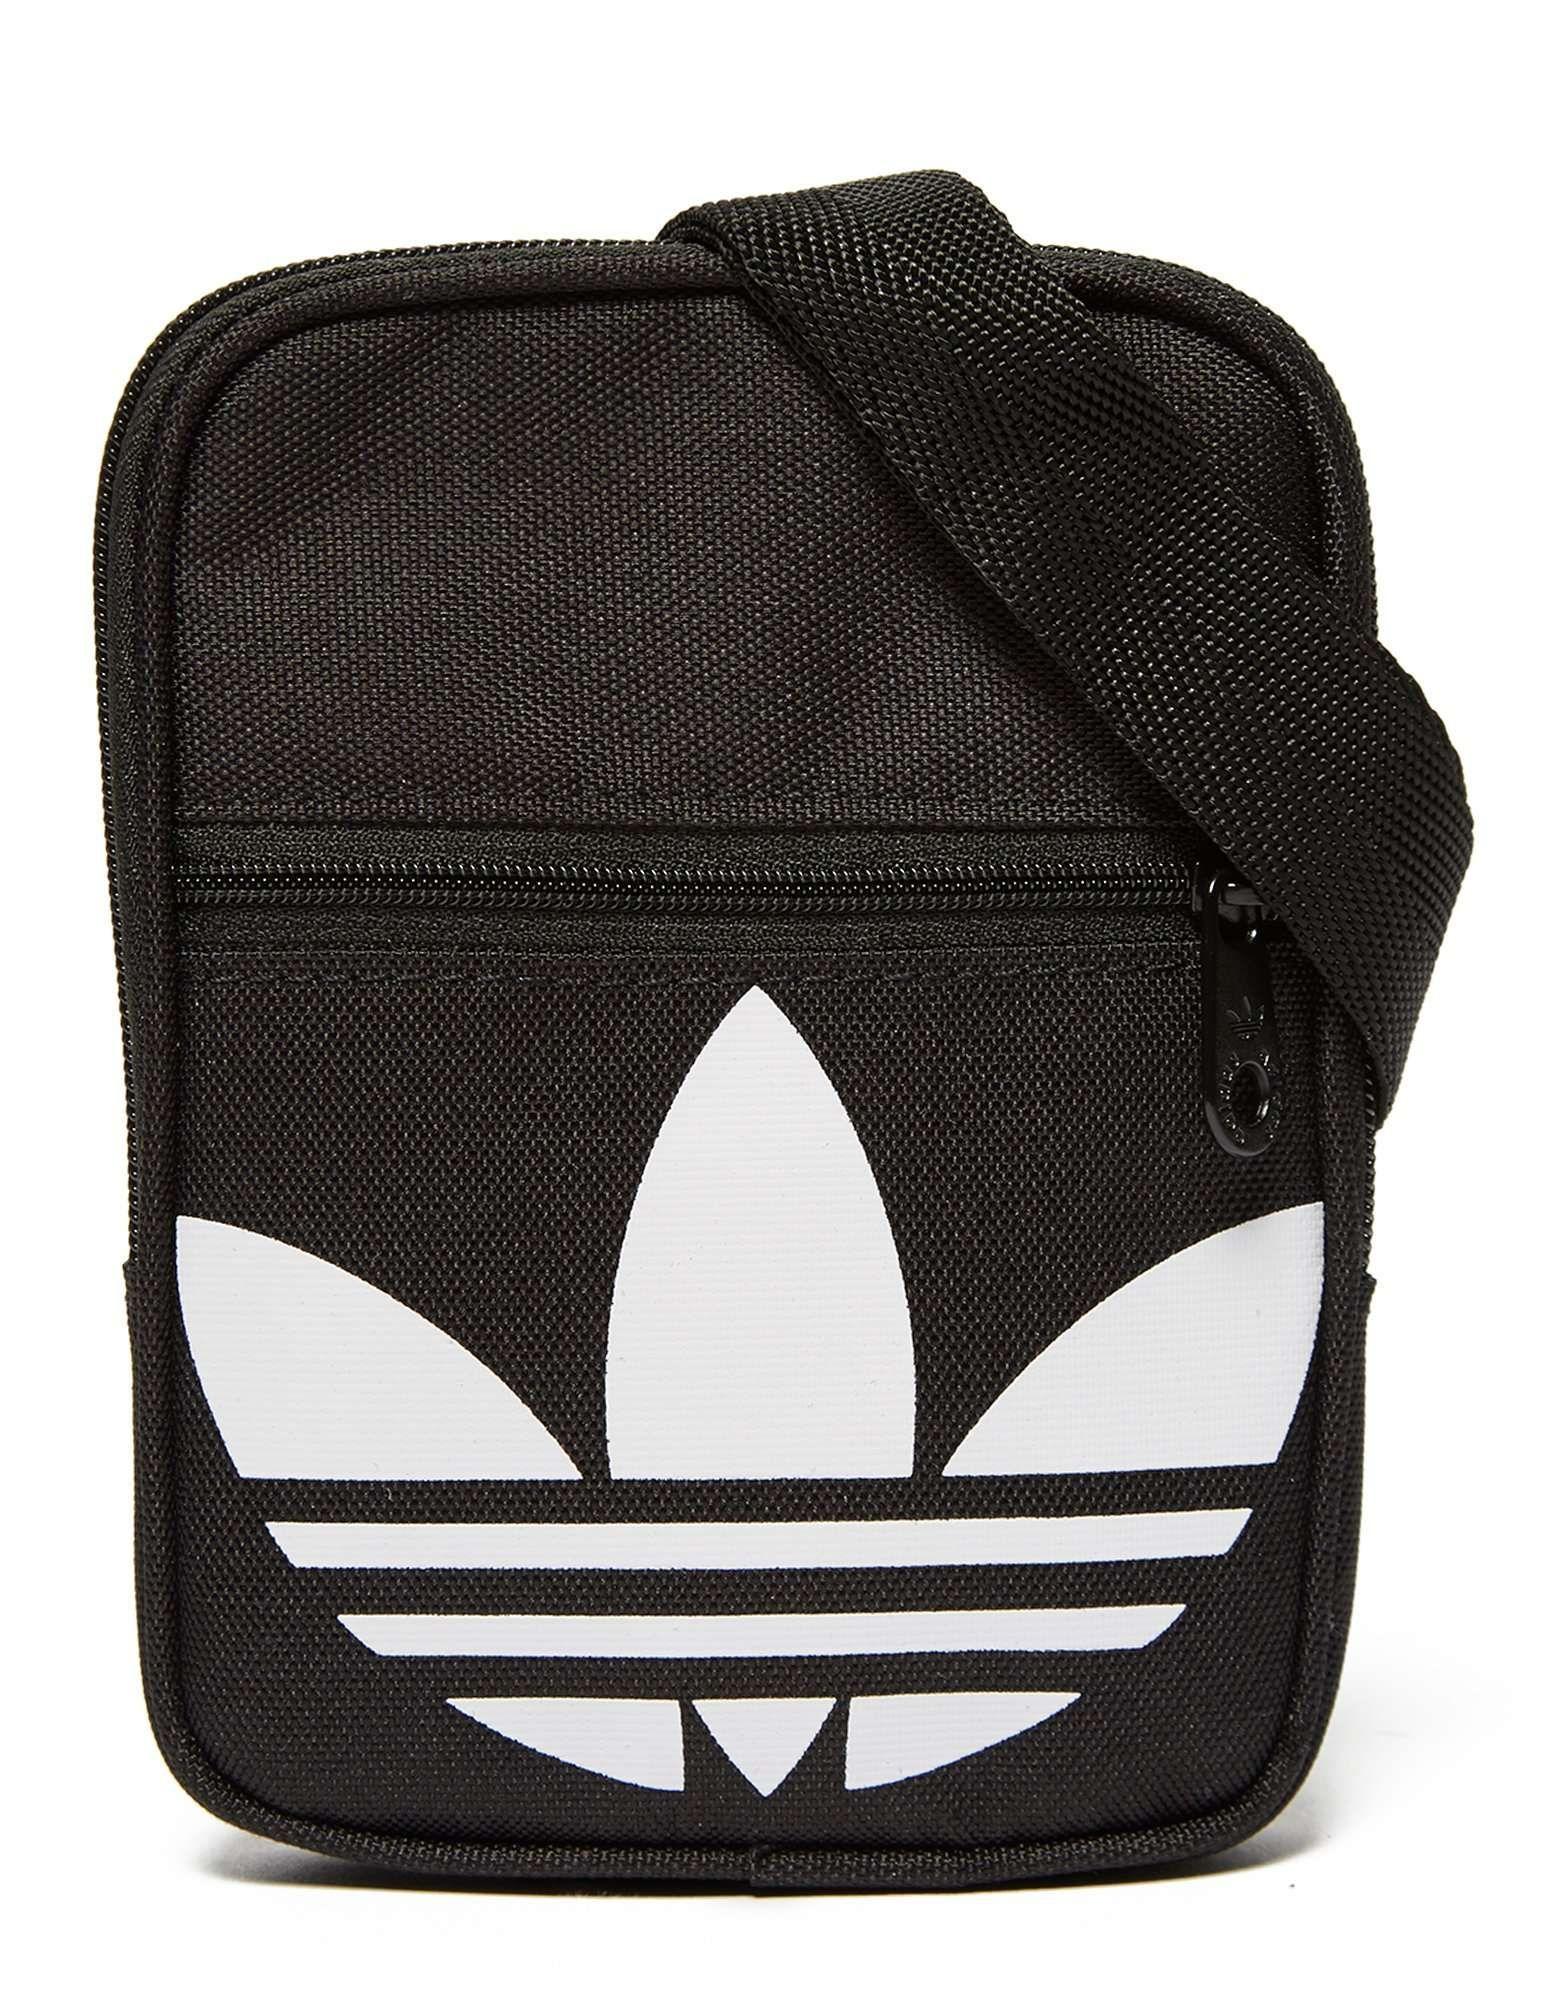 96f5555bba7 adidas Originals Festival Bag - Shop online for adidas Originals Festival  Bag…